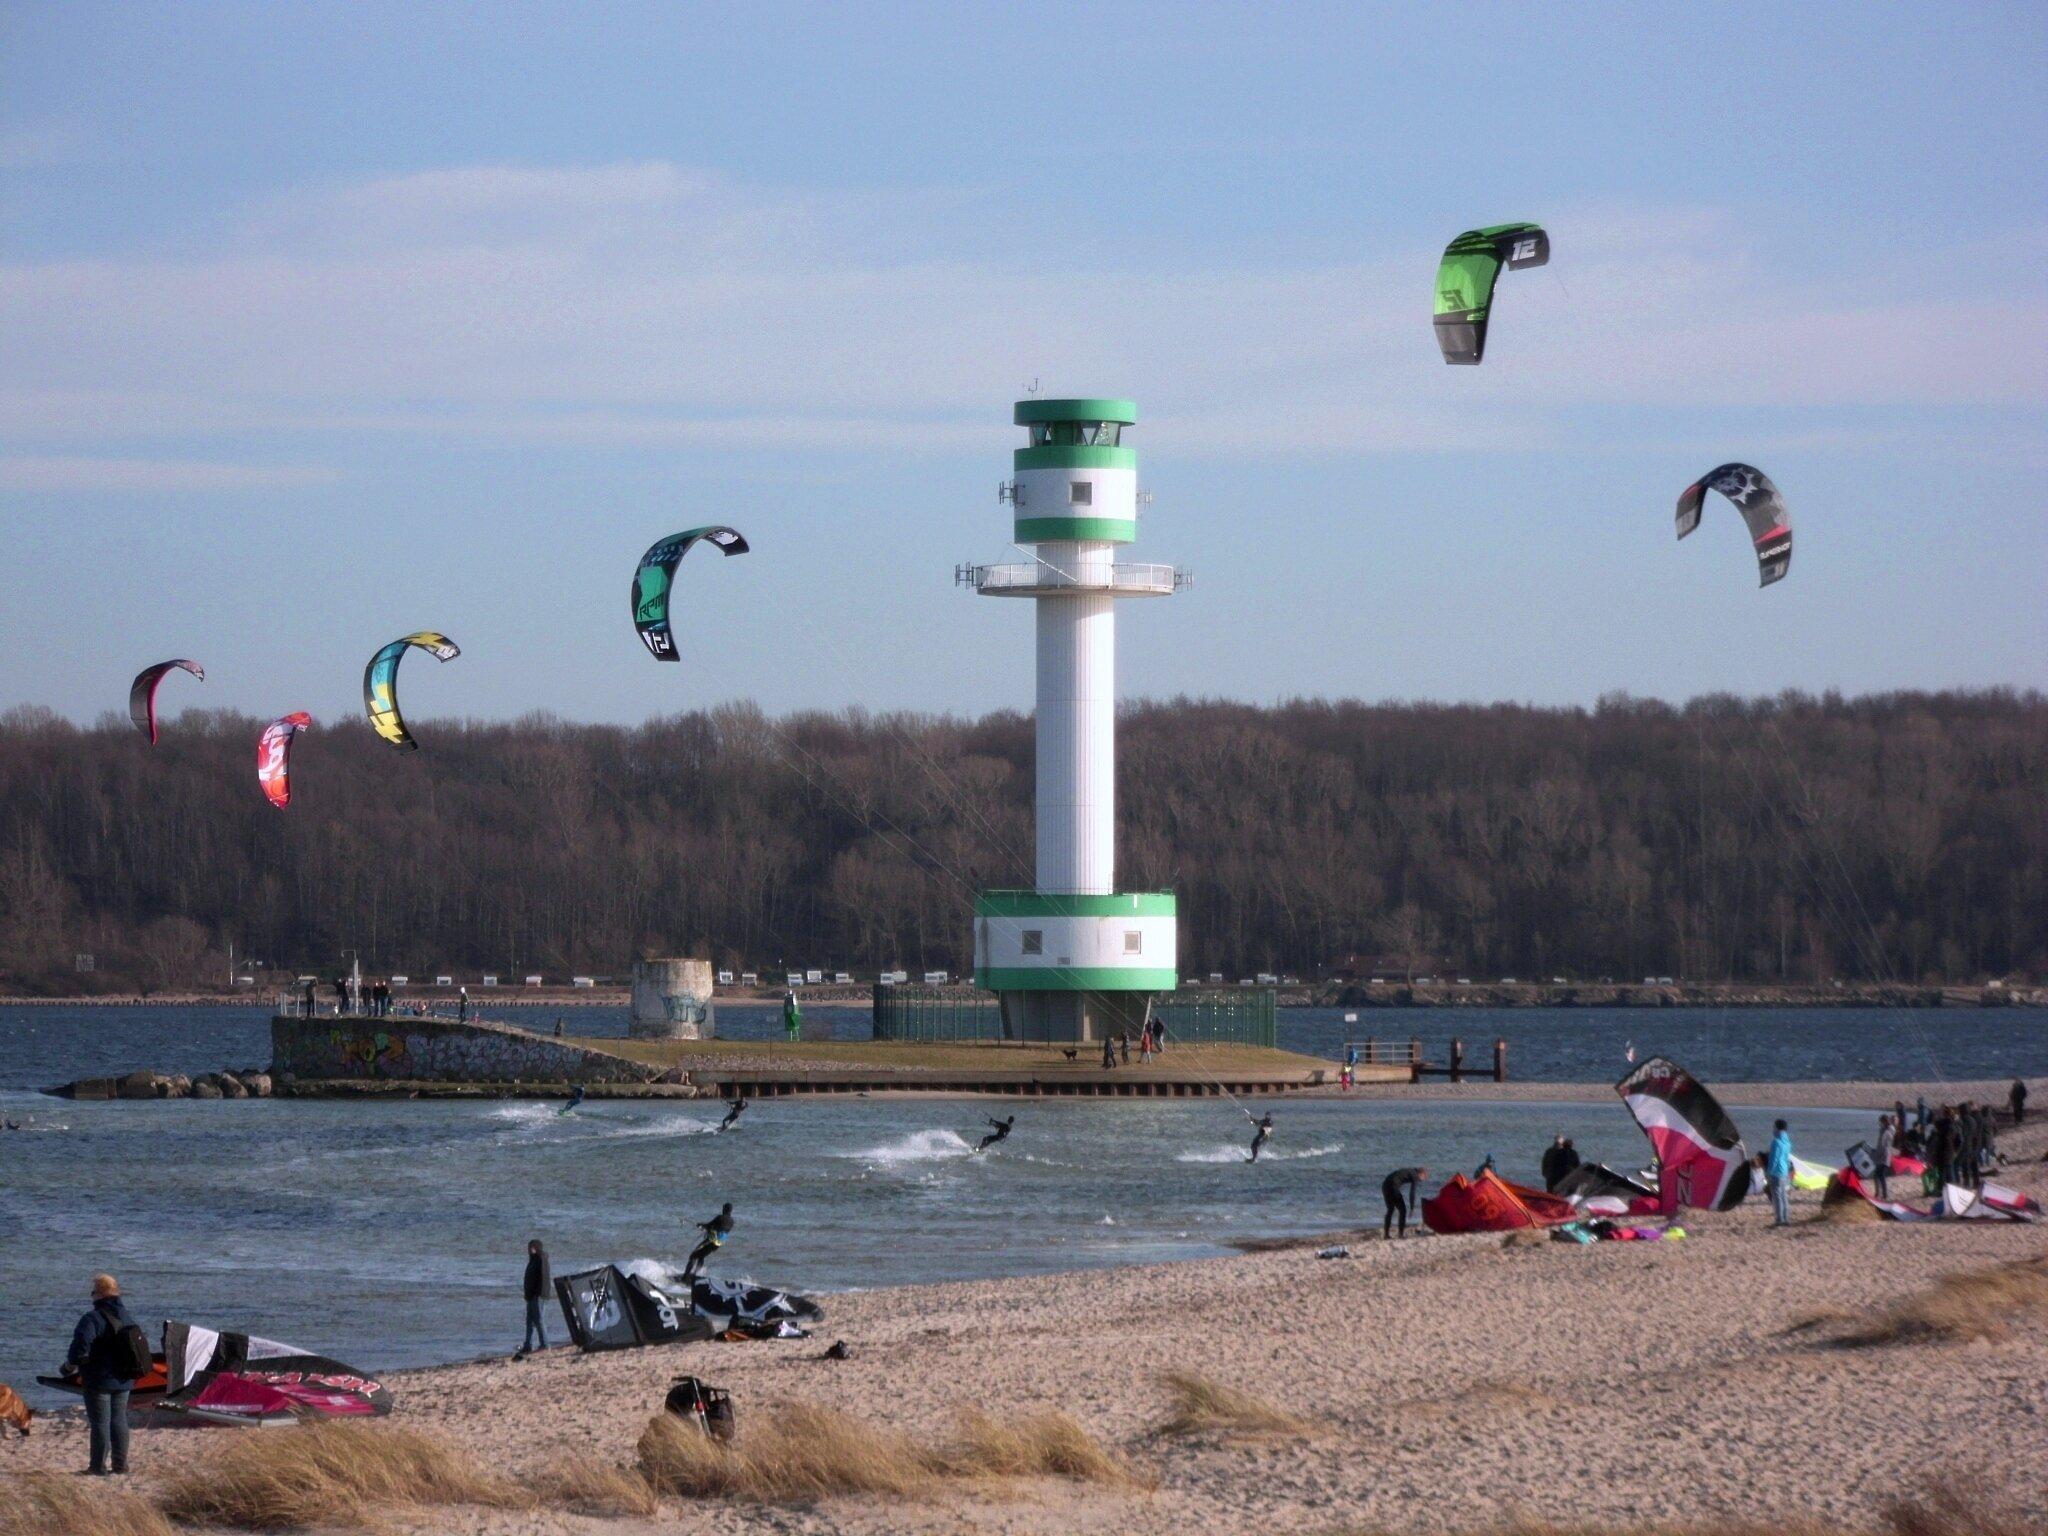 Kiten vor dem Kieler Leuchturm